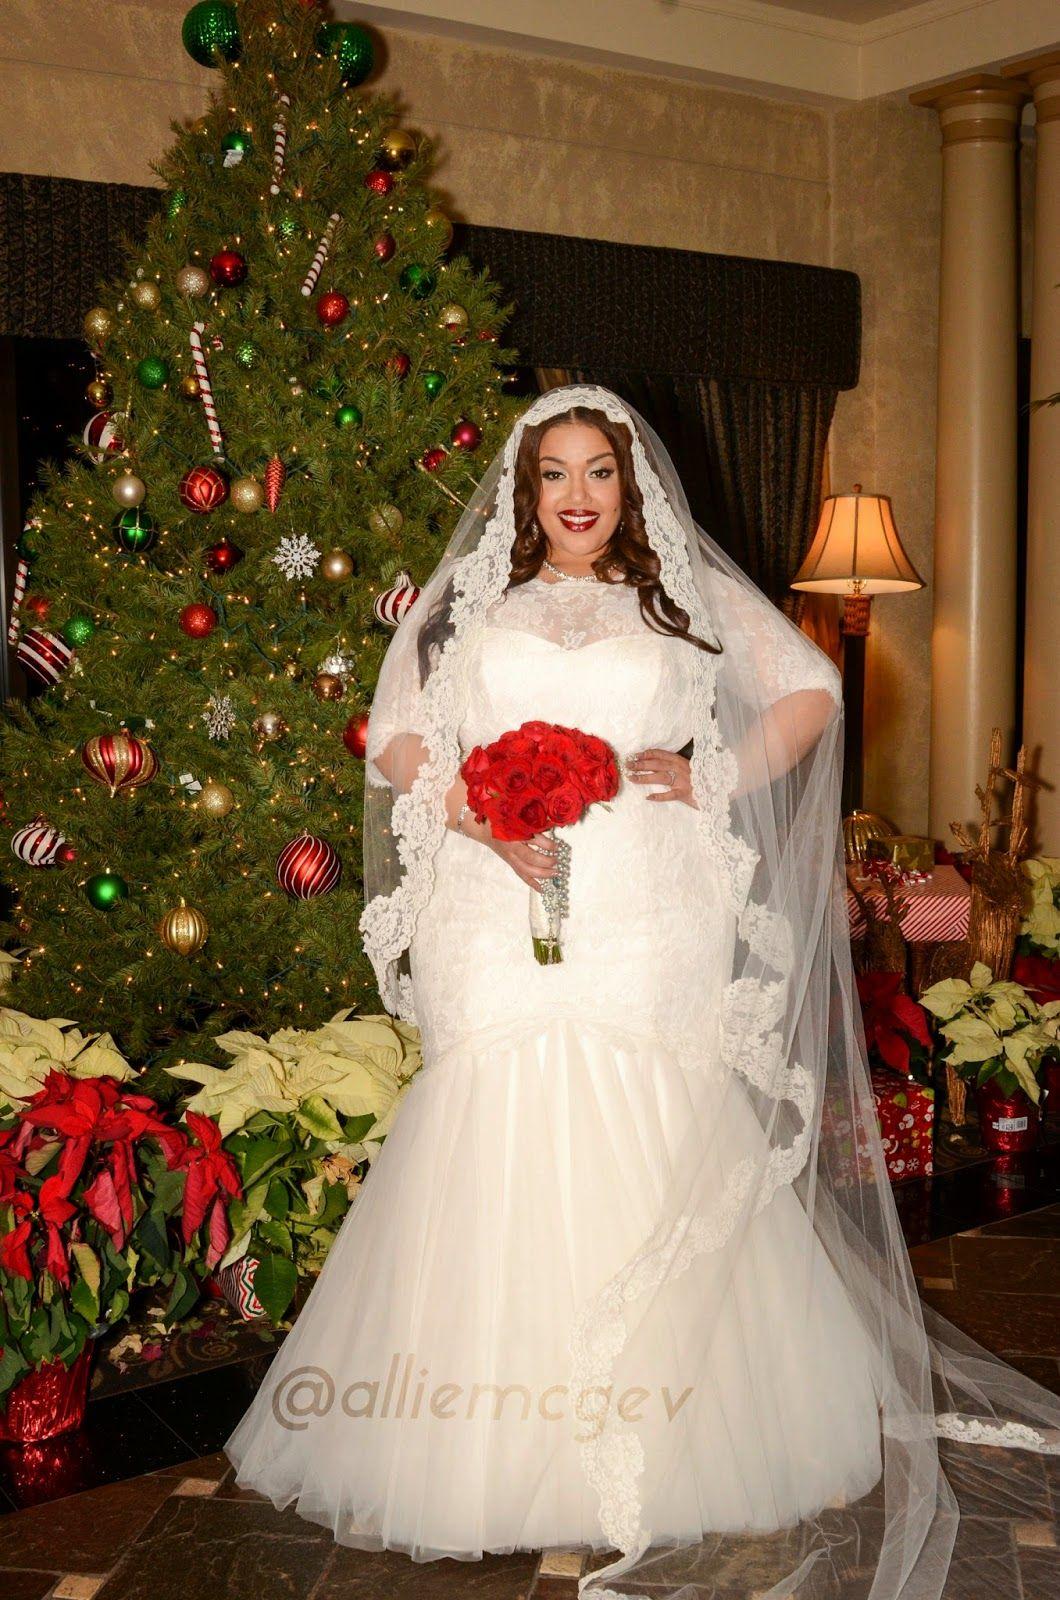 Plus size wedding dresses for 99